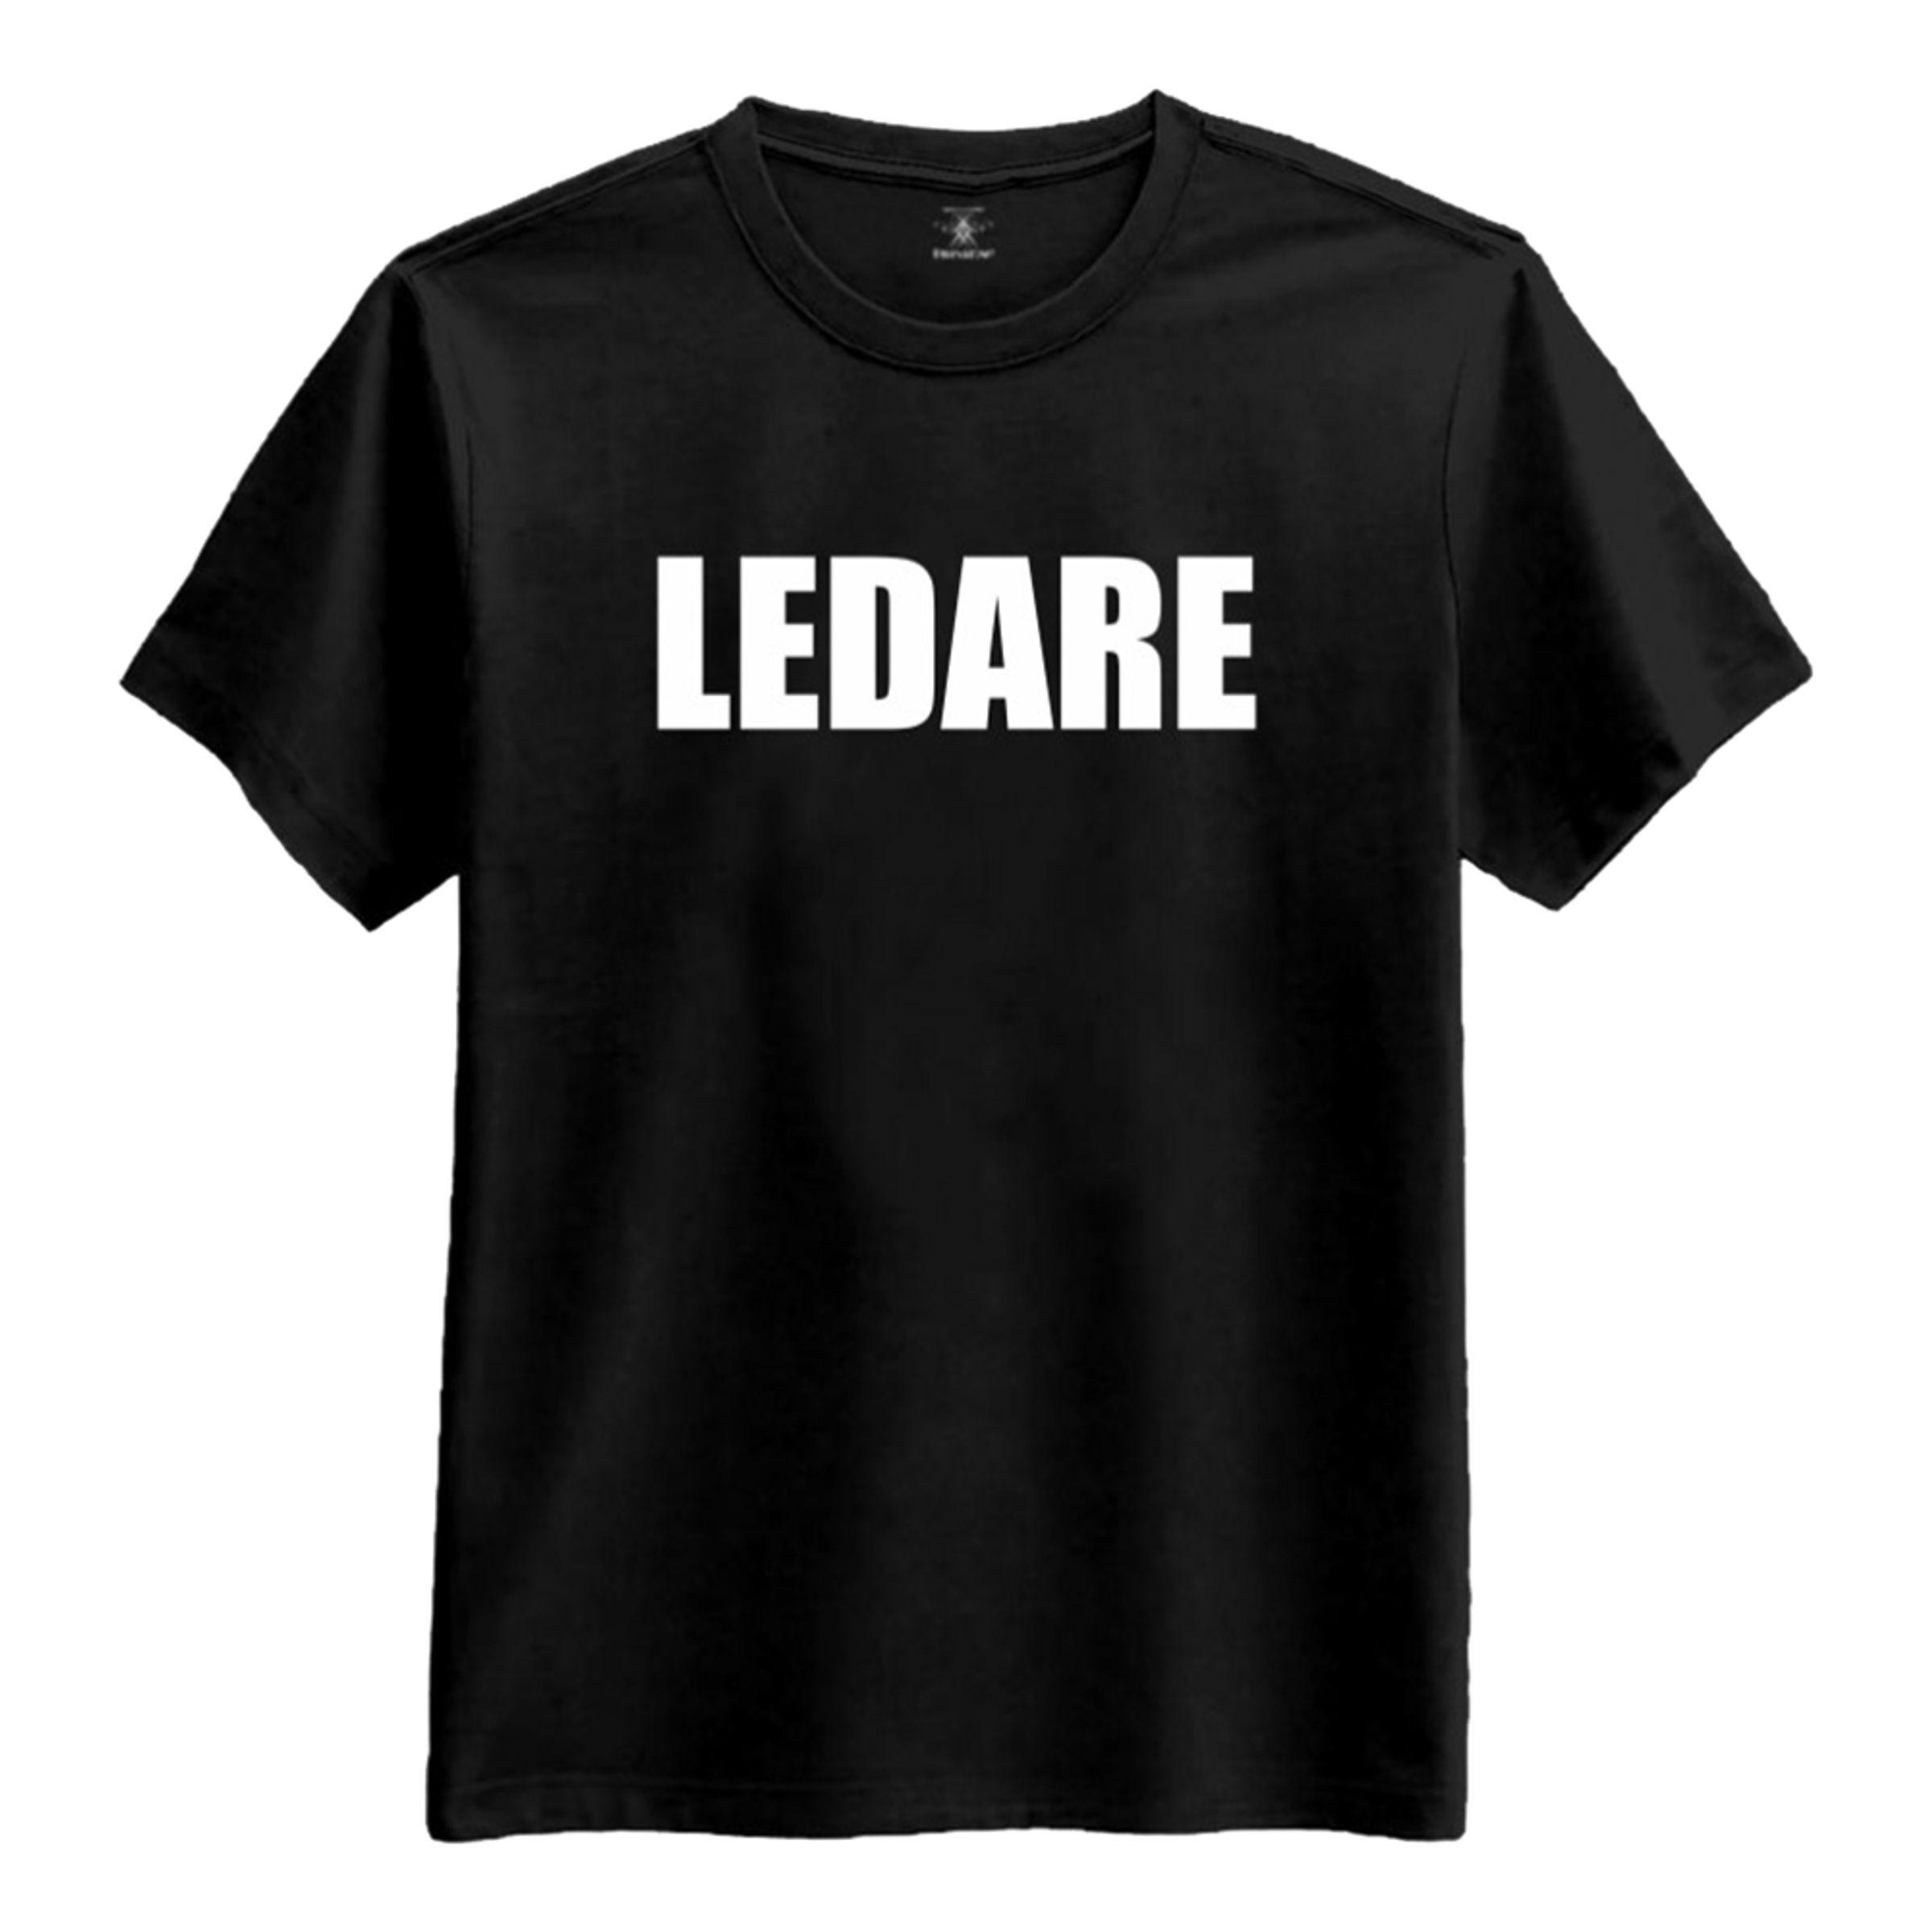 Ledare T-skjorte - X-Large